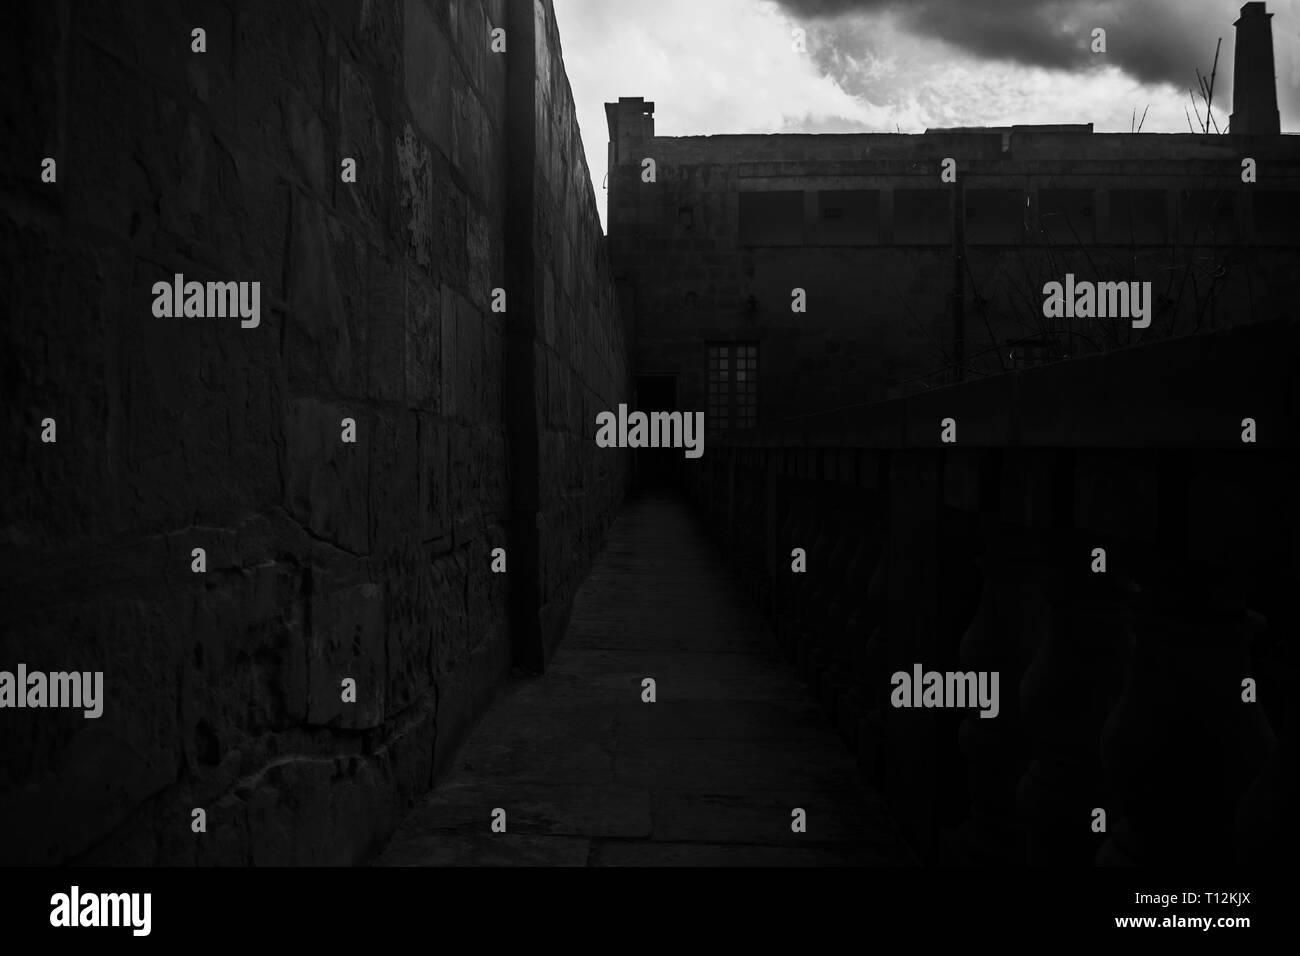 The Nightmare Bridge. A scary bridge in black and white. - Stock Image